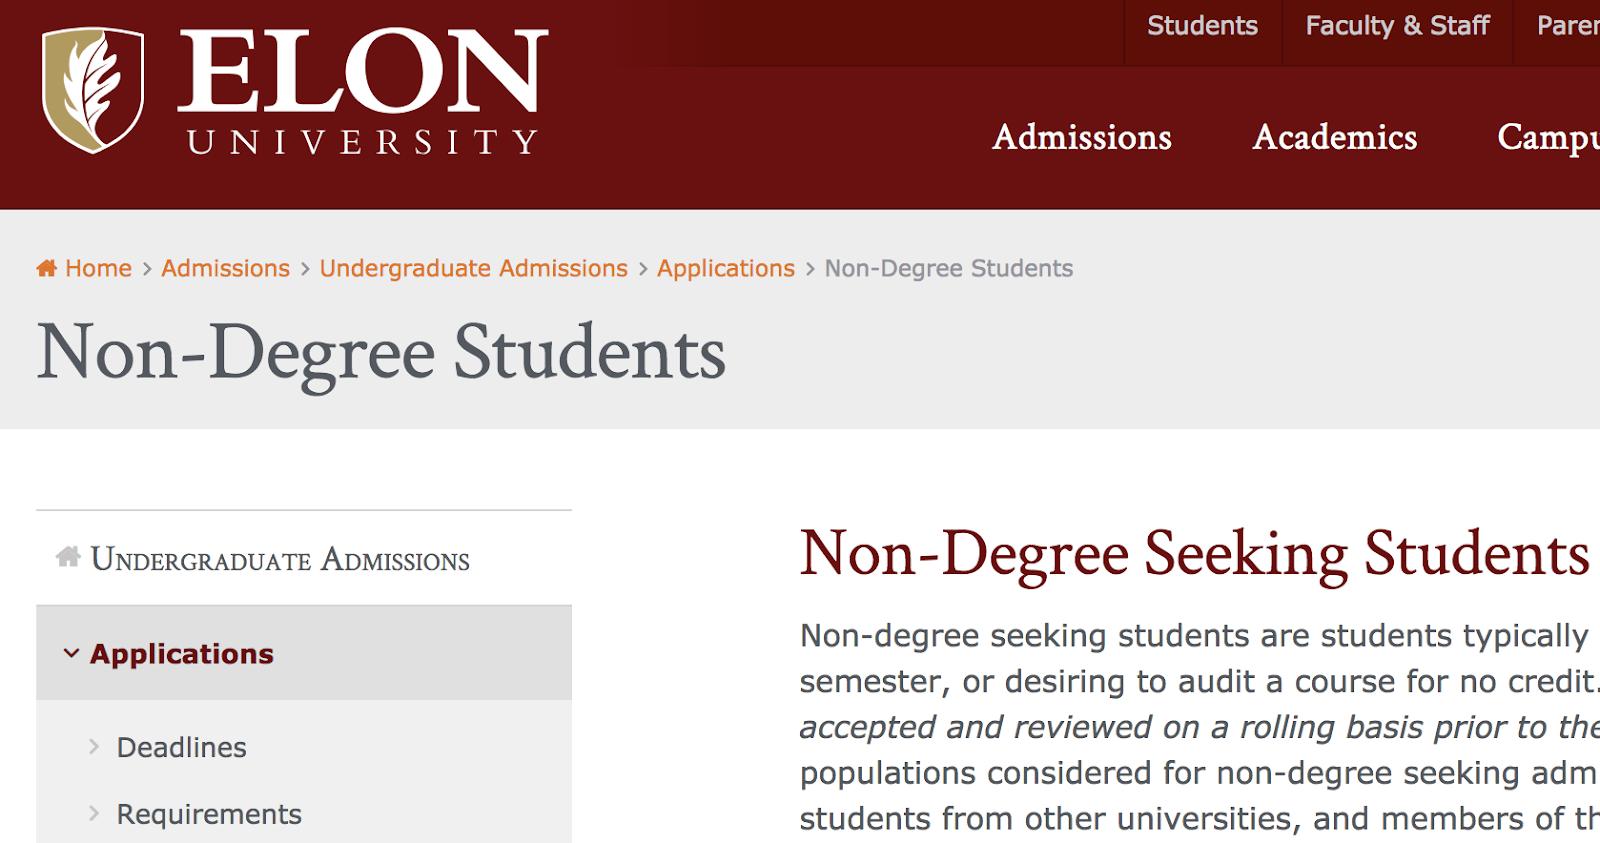 an example of breadcrumb navigation on the elon university website